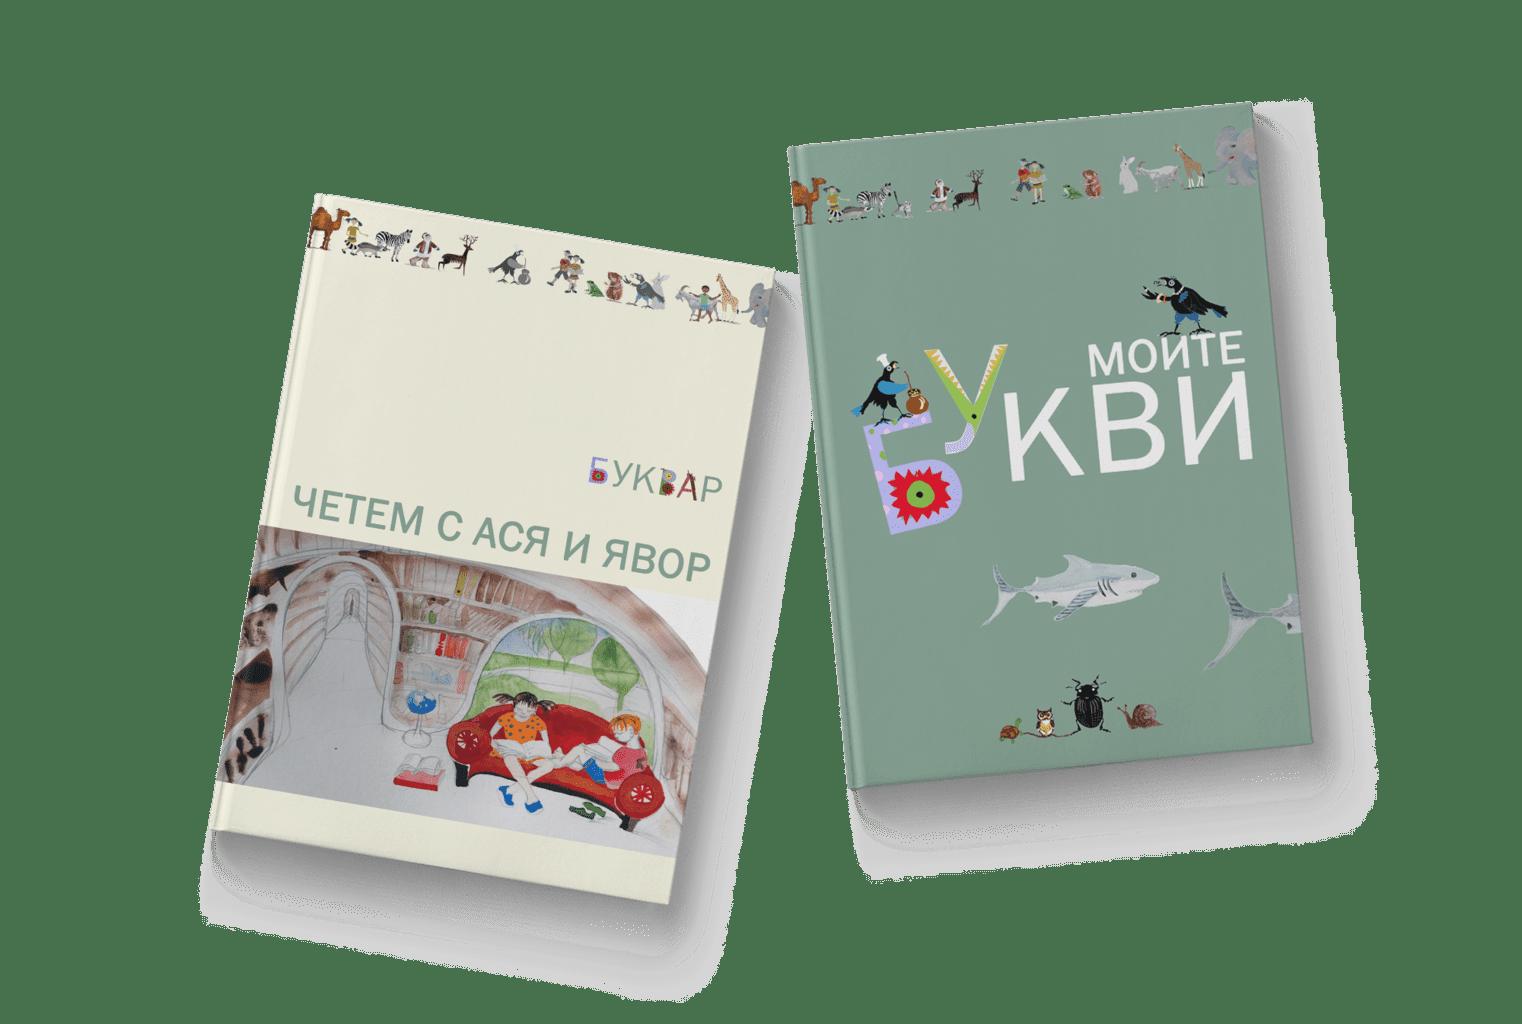 Prepodavame.bg - От учители за учители